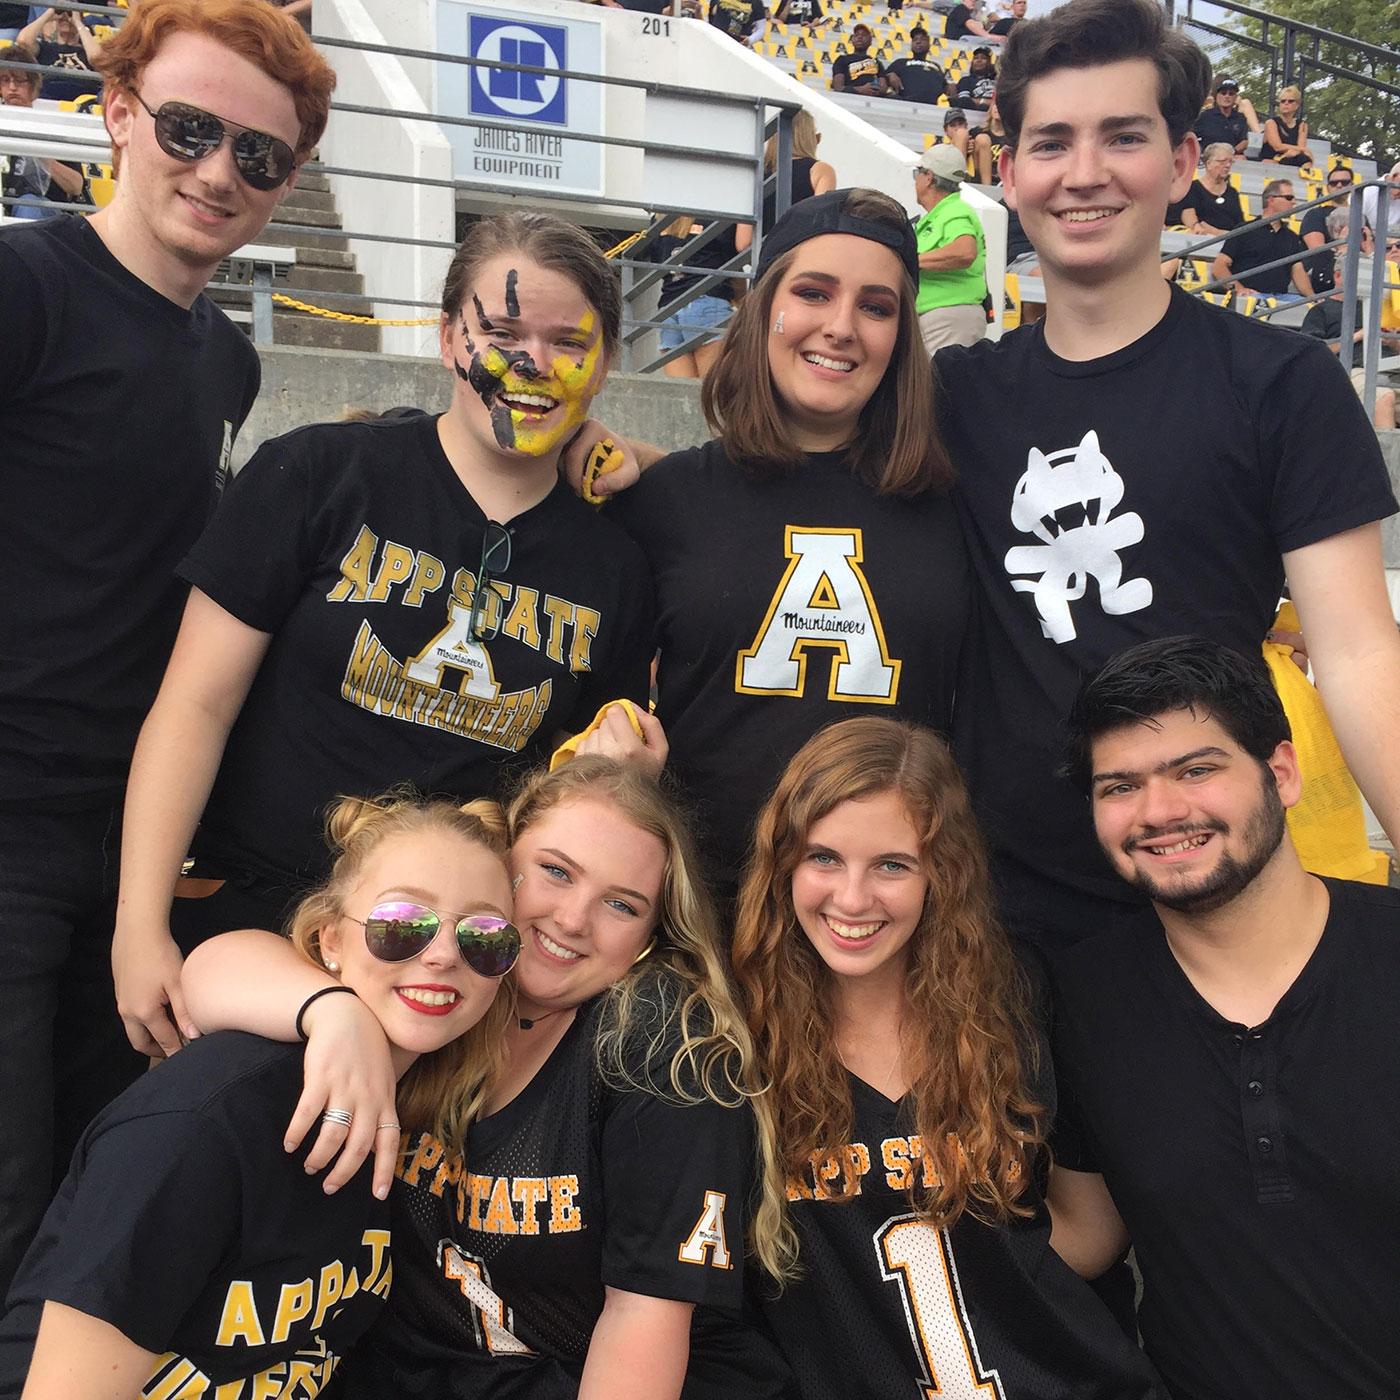 Art Haus residents at football game